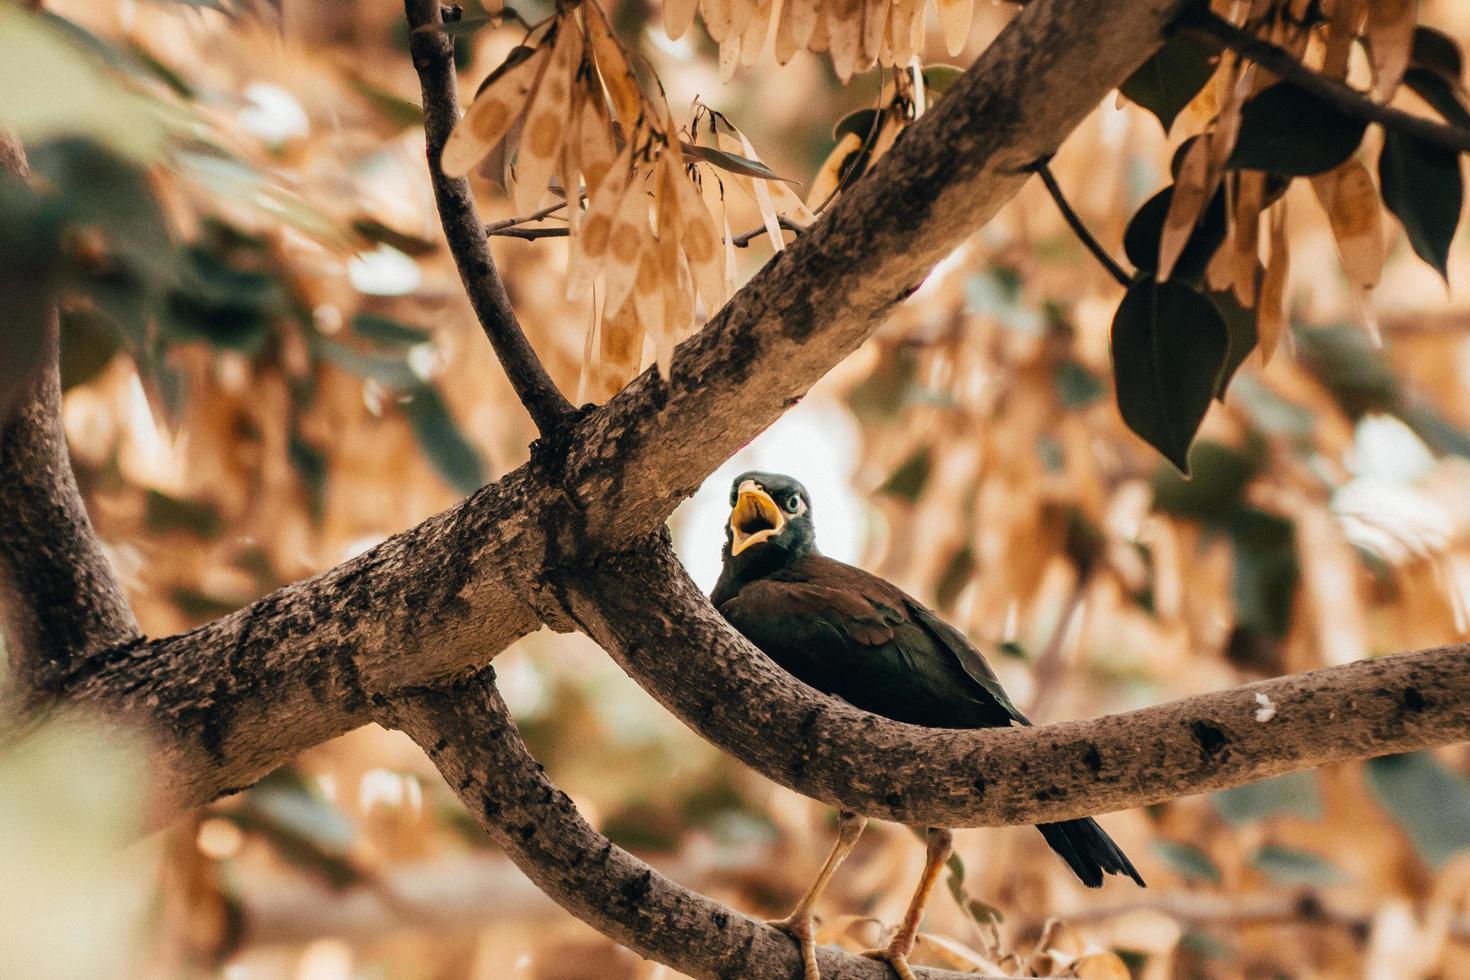 Blackbird gazouillant sur une branche photo